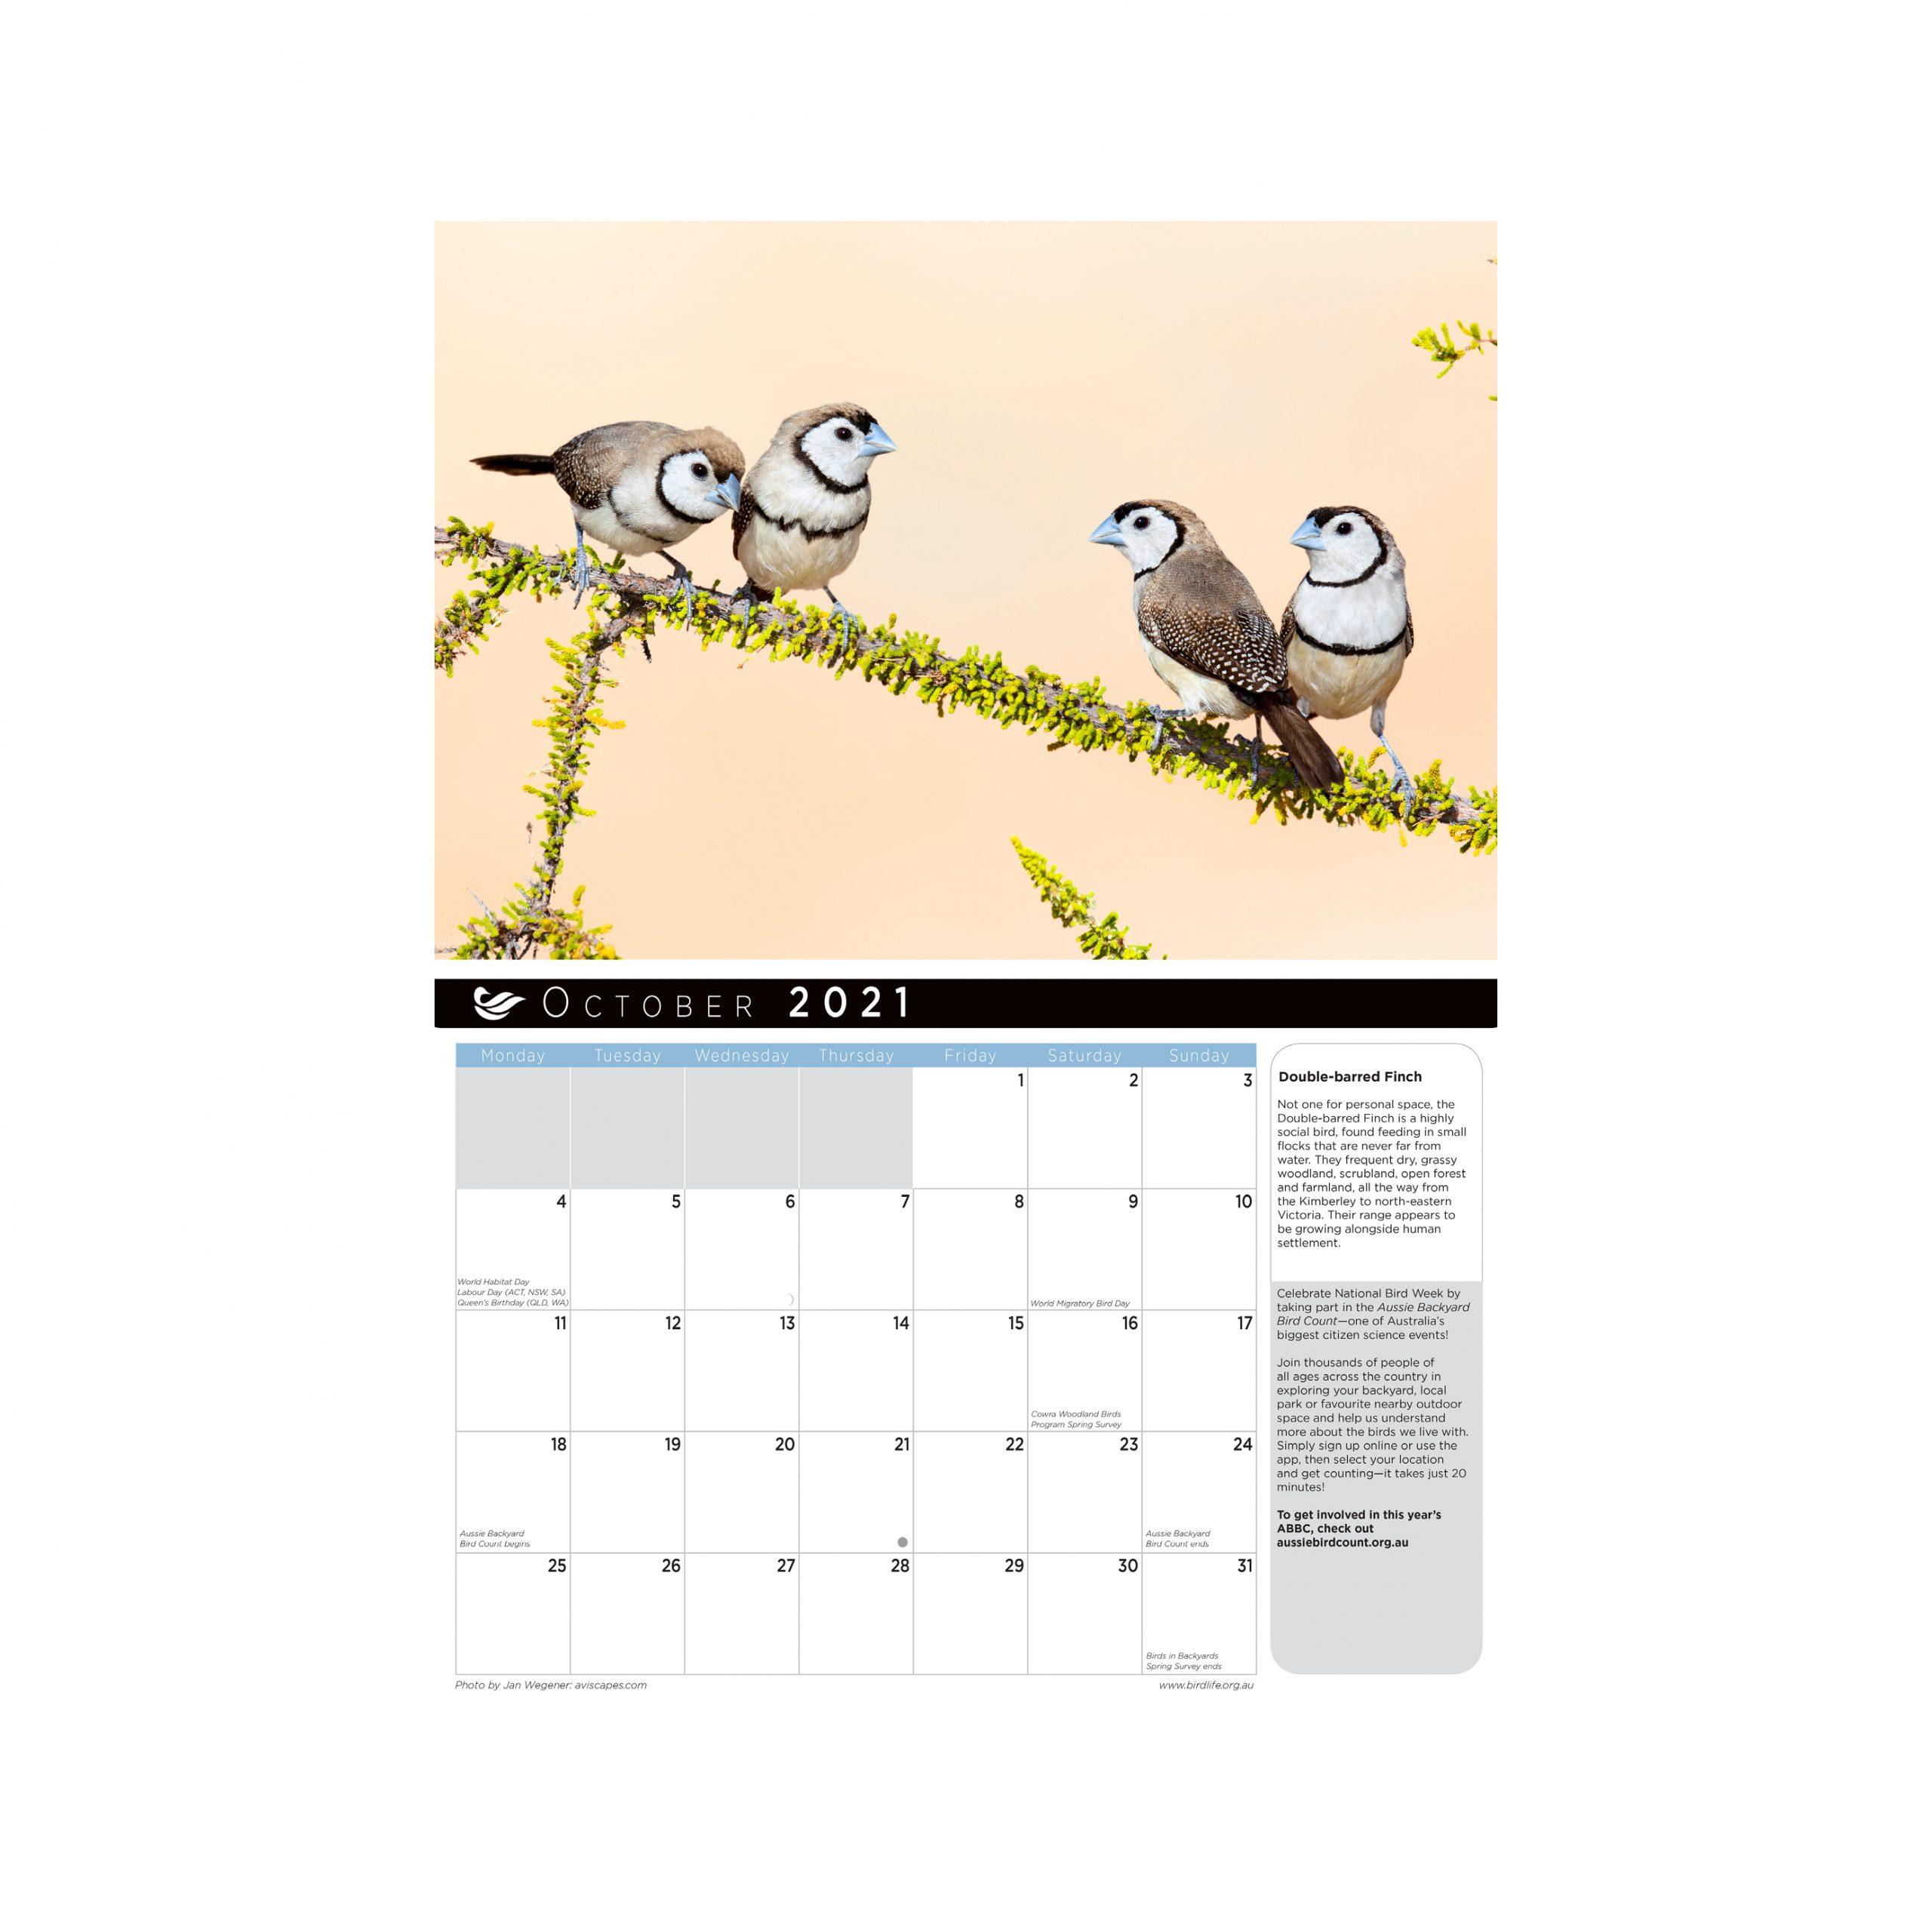 2021 Birds Of A Feather Calendar | Birdlife Australia within Important Awarness Dates 2021 Australia